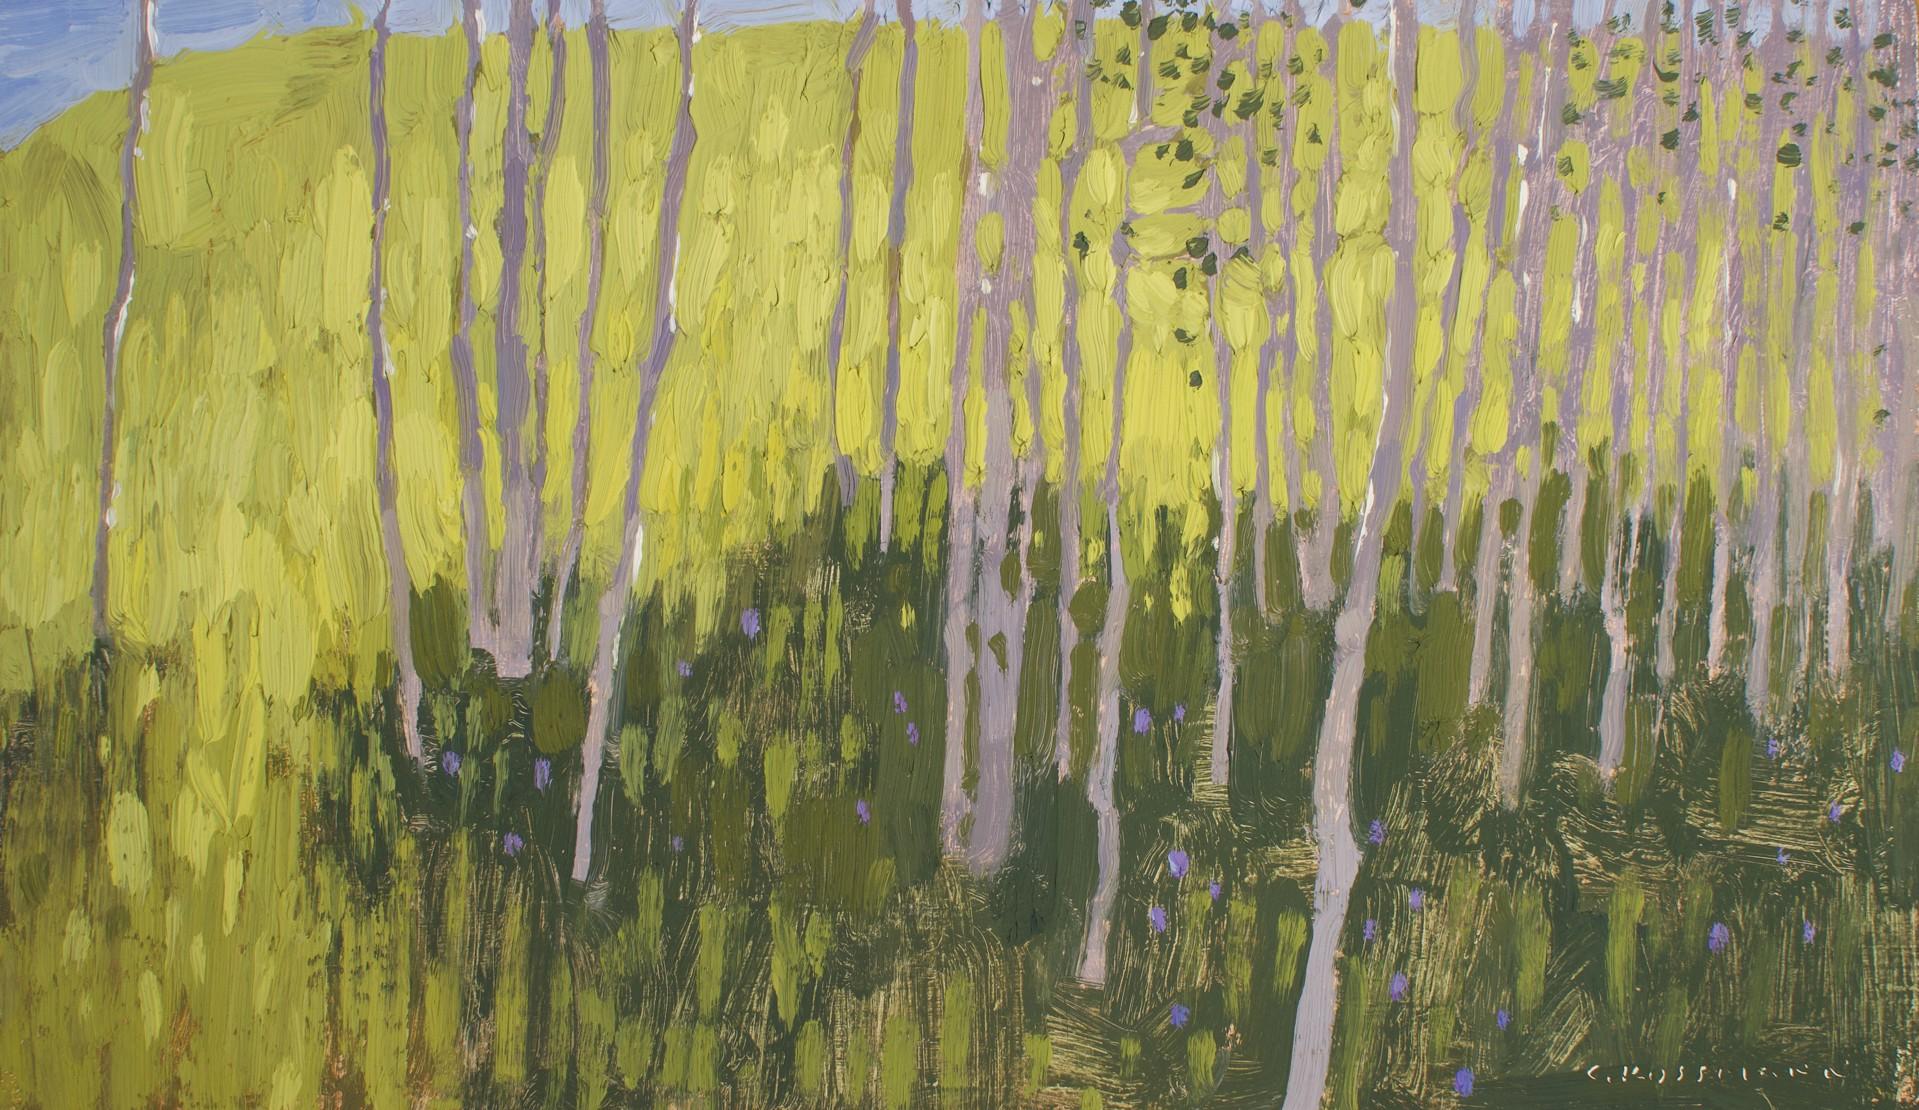 Morning Light and Aspen Shade by David Grossmann